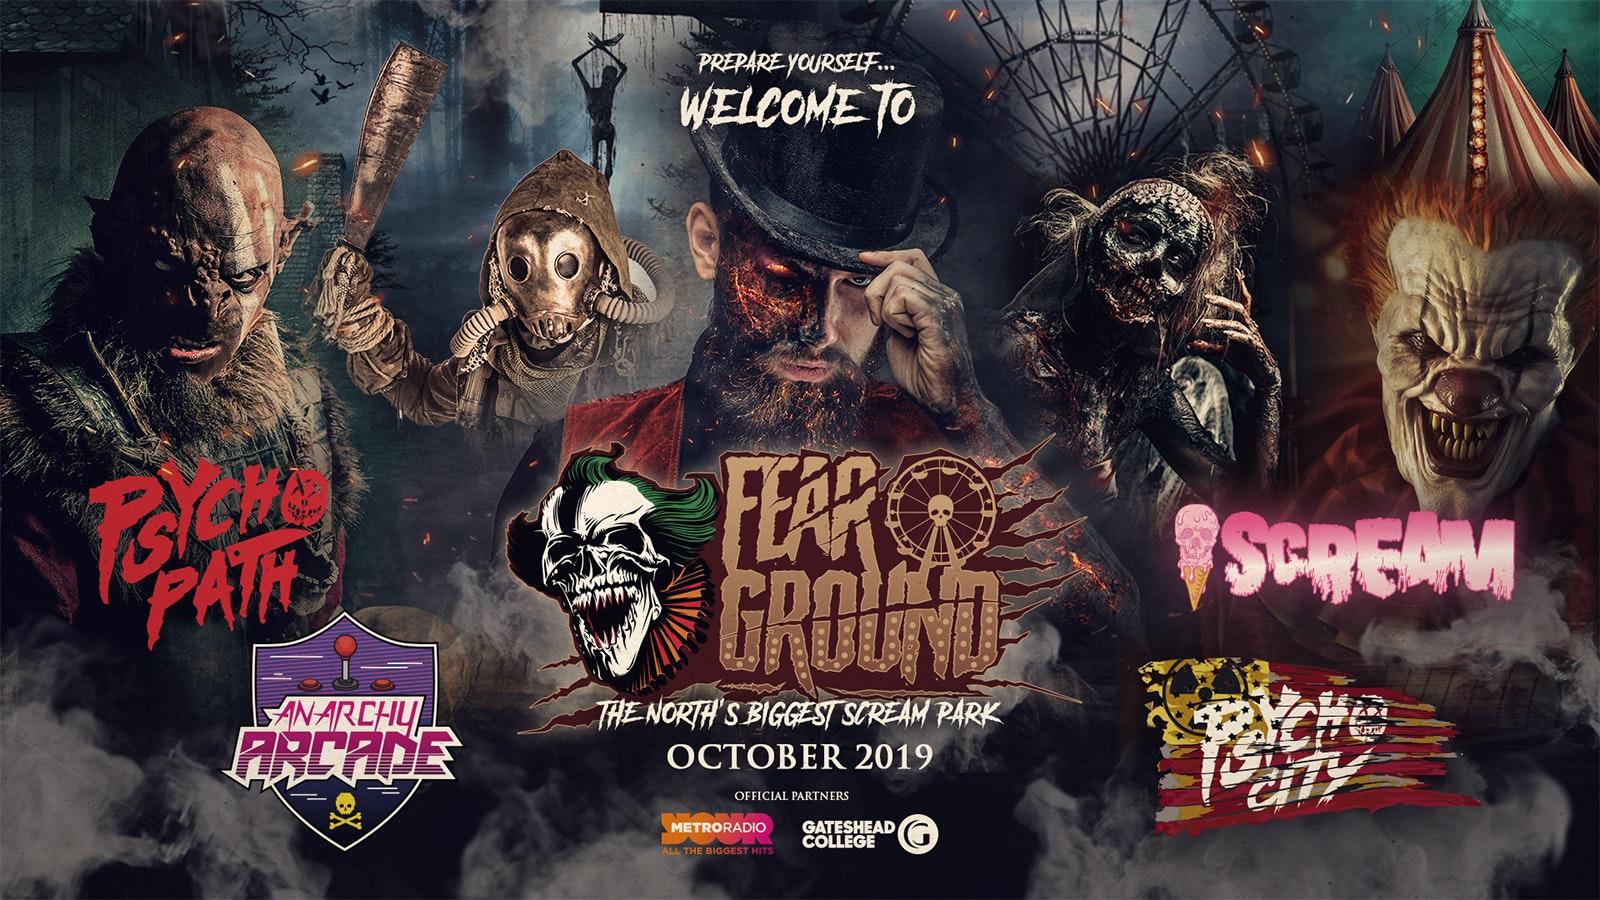 Psycho Path – Thursday 31st October 2019